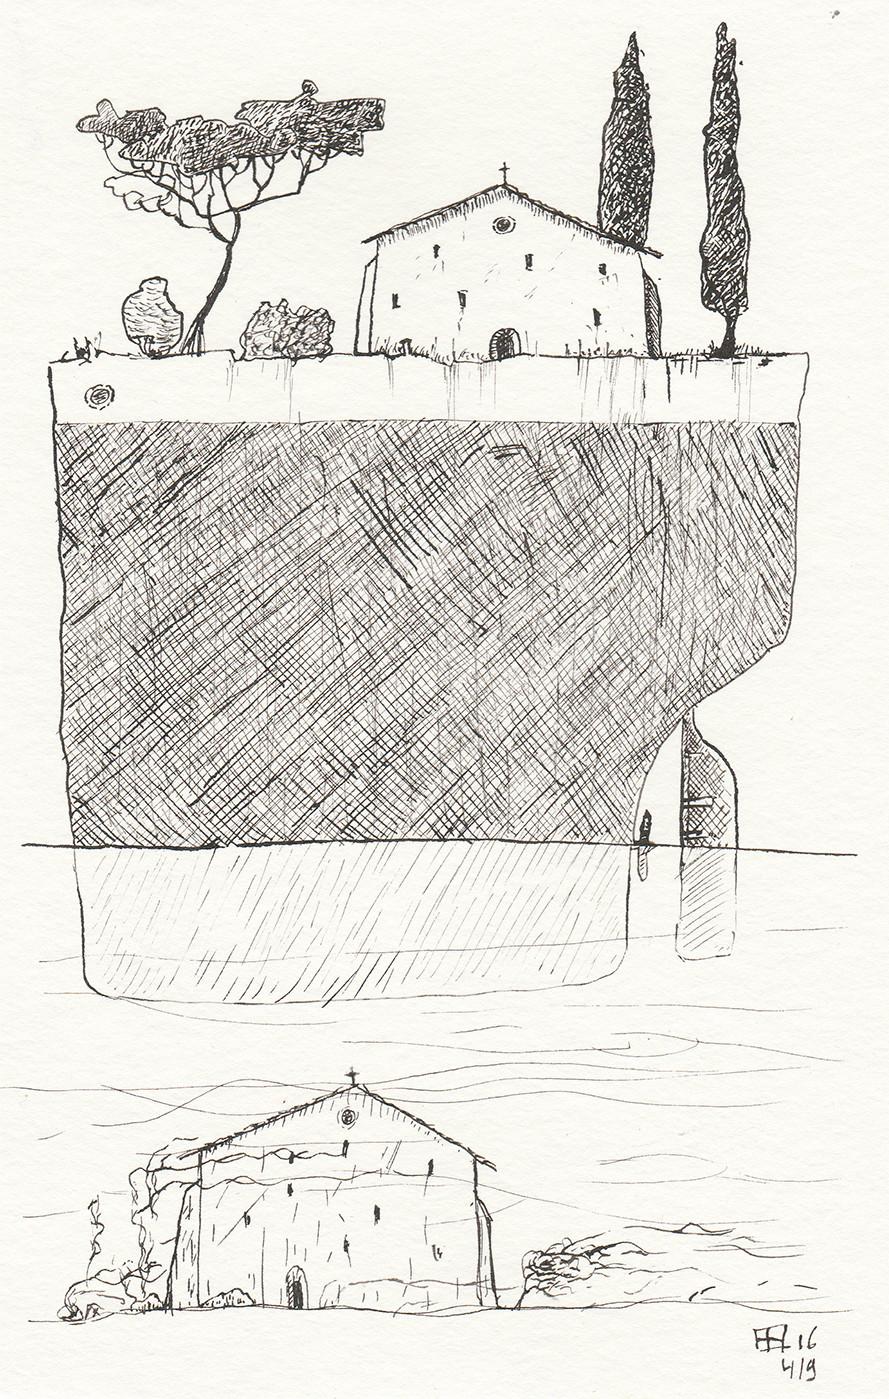 Pen drawing of church on ship